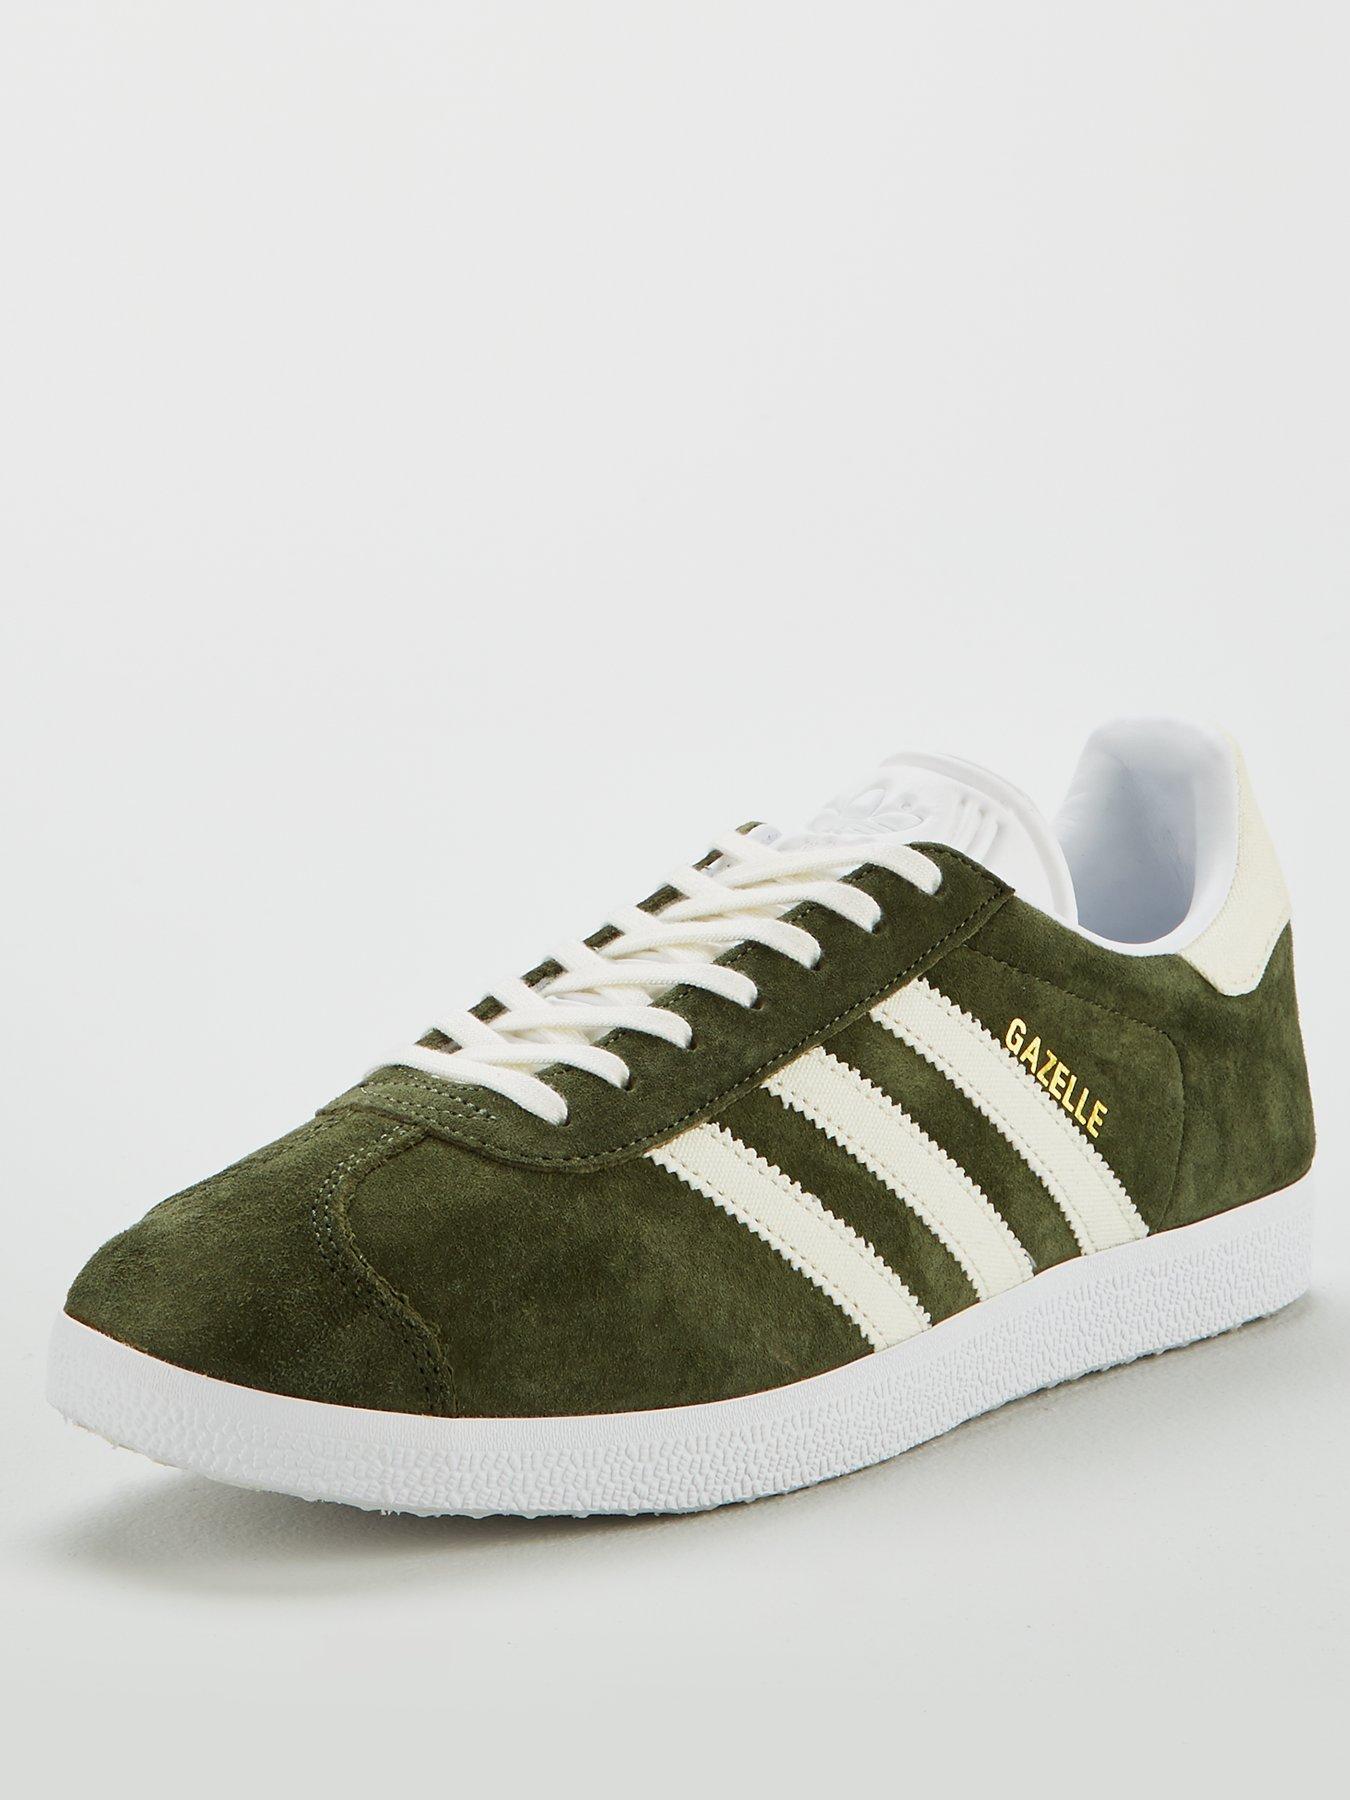 6b8c16bc1 shop mens on feet adidas originals alexander wang coffee sneakersadidas  tennis shoesunique b4b79 d6e4f  purchase adidas originals gazelle d1ec3  e8fb7